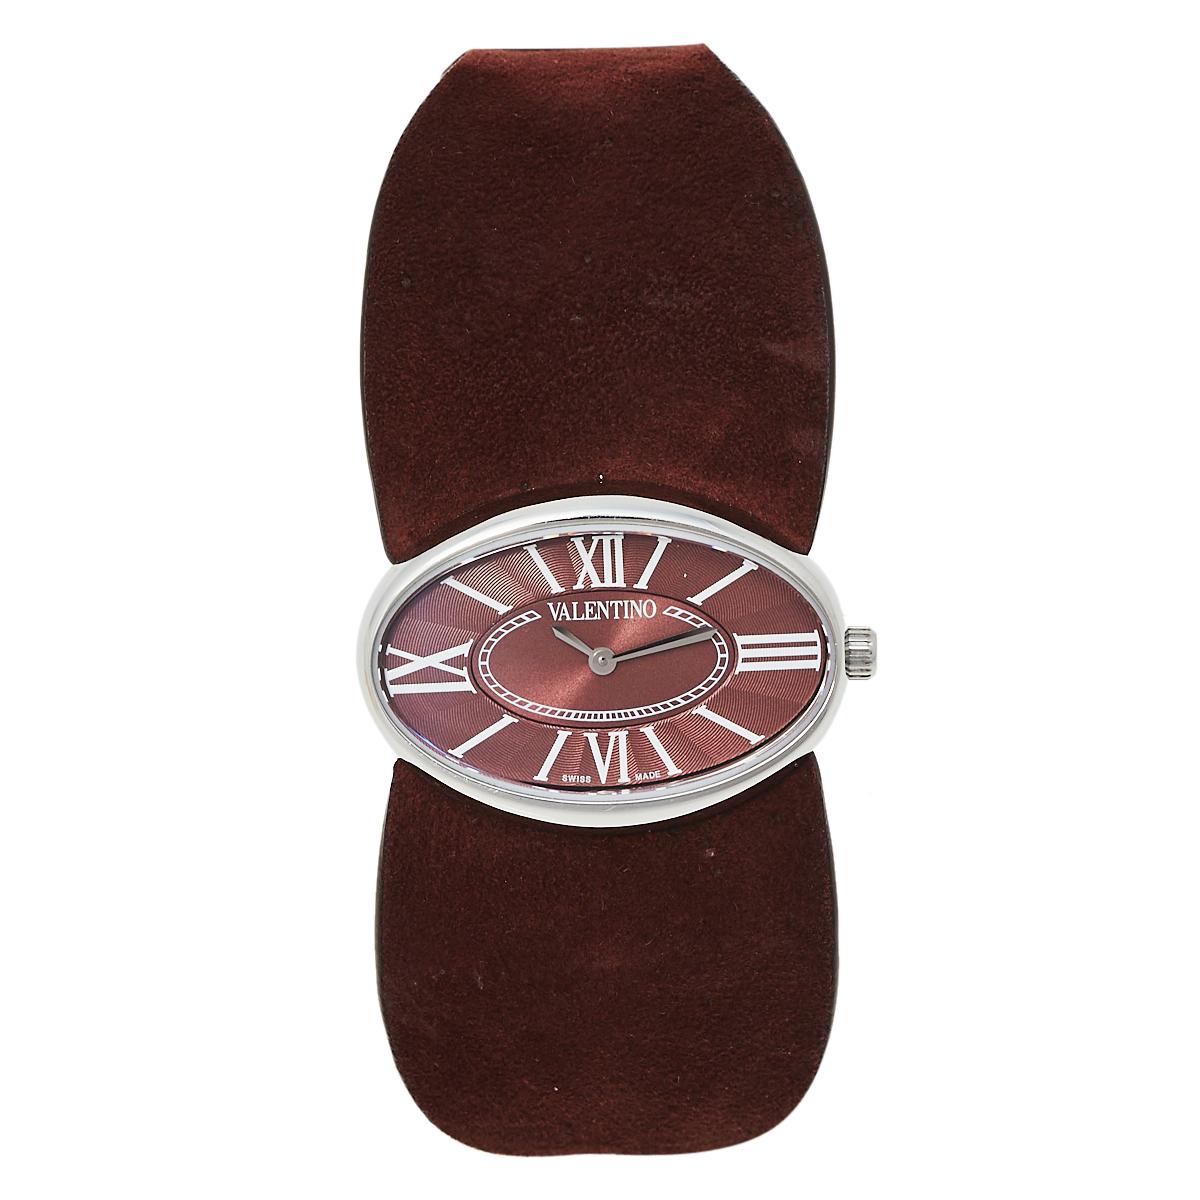 Pre-owned Valentino Garavani Burgundy Stainless Steel & Leather Signature Women's Wristwatch 36 Mm